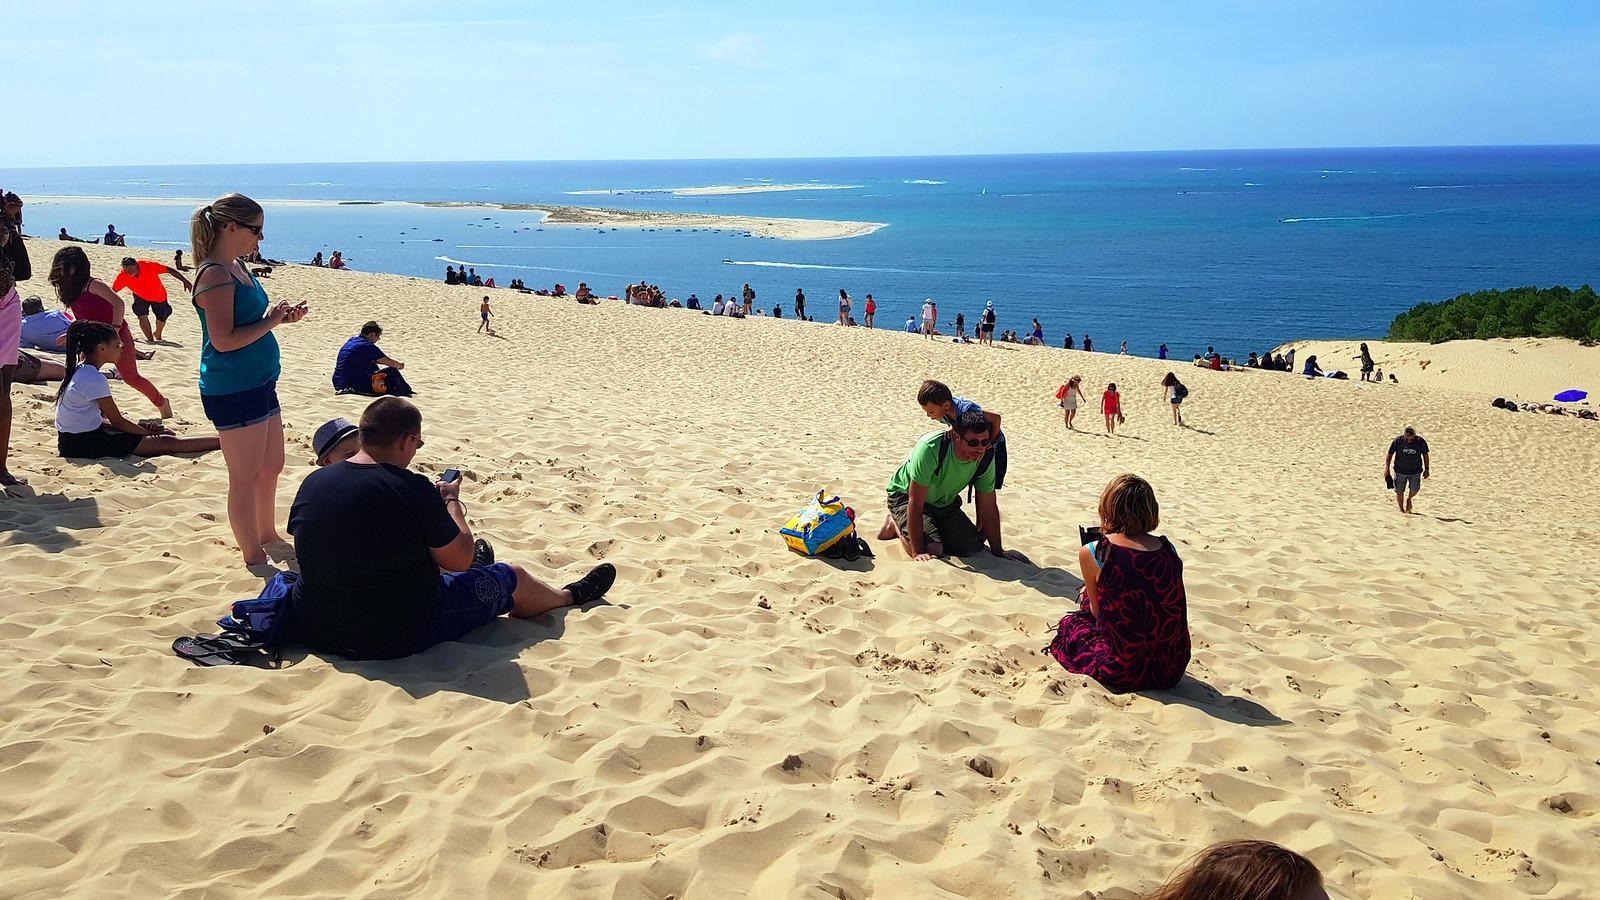 Dune du Pilat Francia Burdeos dune du pilat - 44217263300 3f9764fc57 h - Dune du Pilat, la duna de arena más alta de Europa